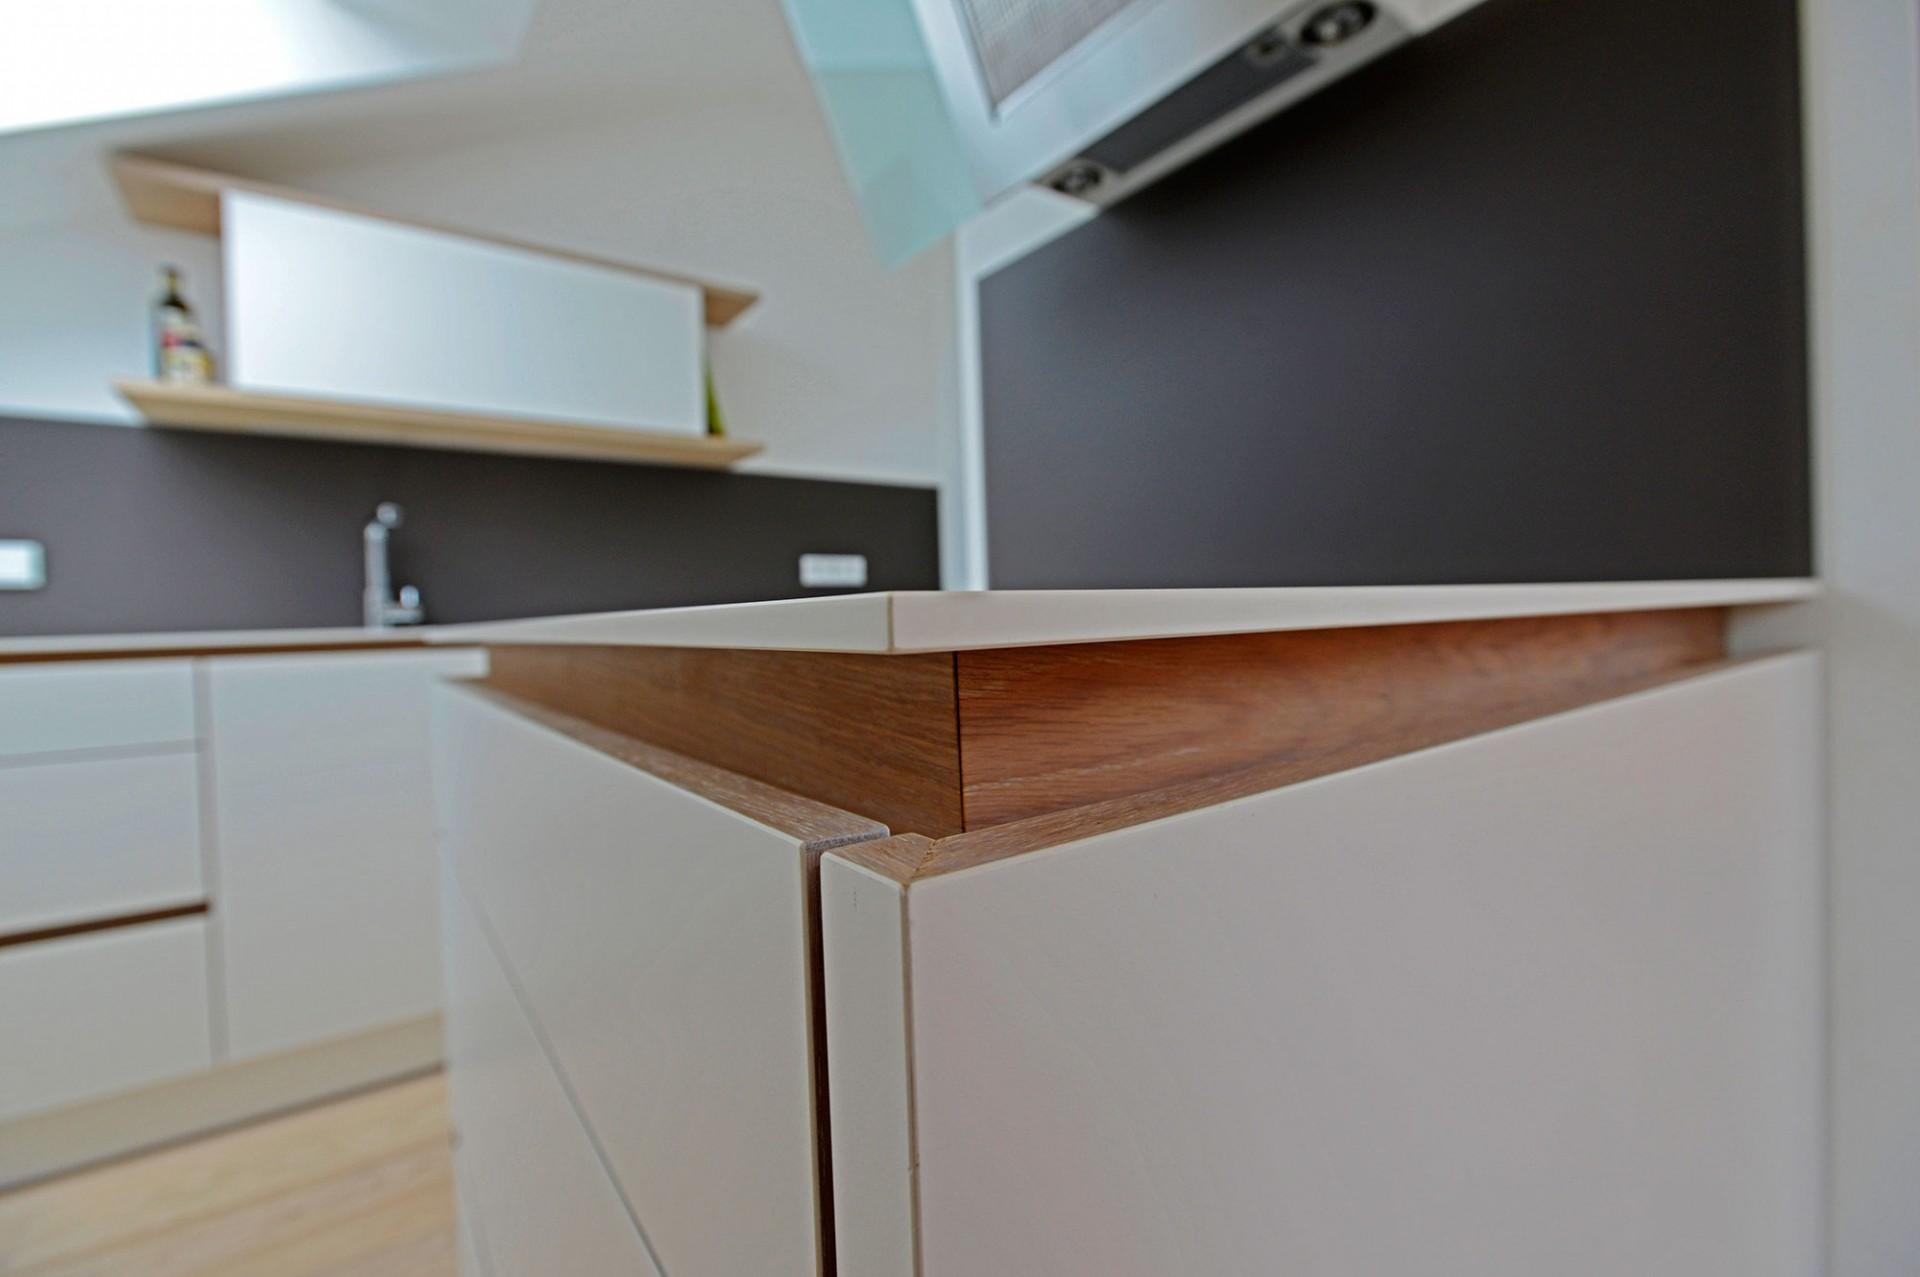 k che in dachschr ge. Black Bedroom Furniture Sets. Home Design Ideas